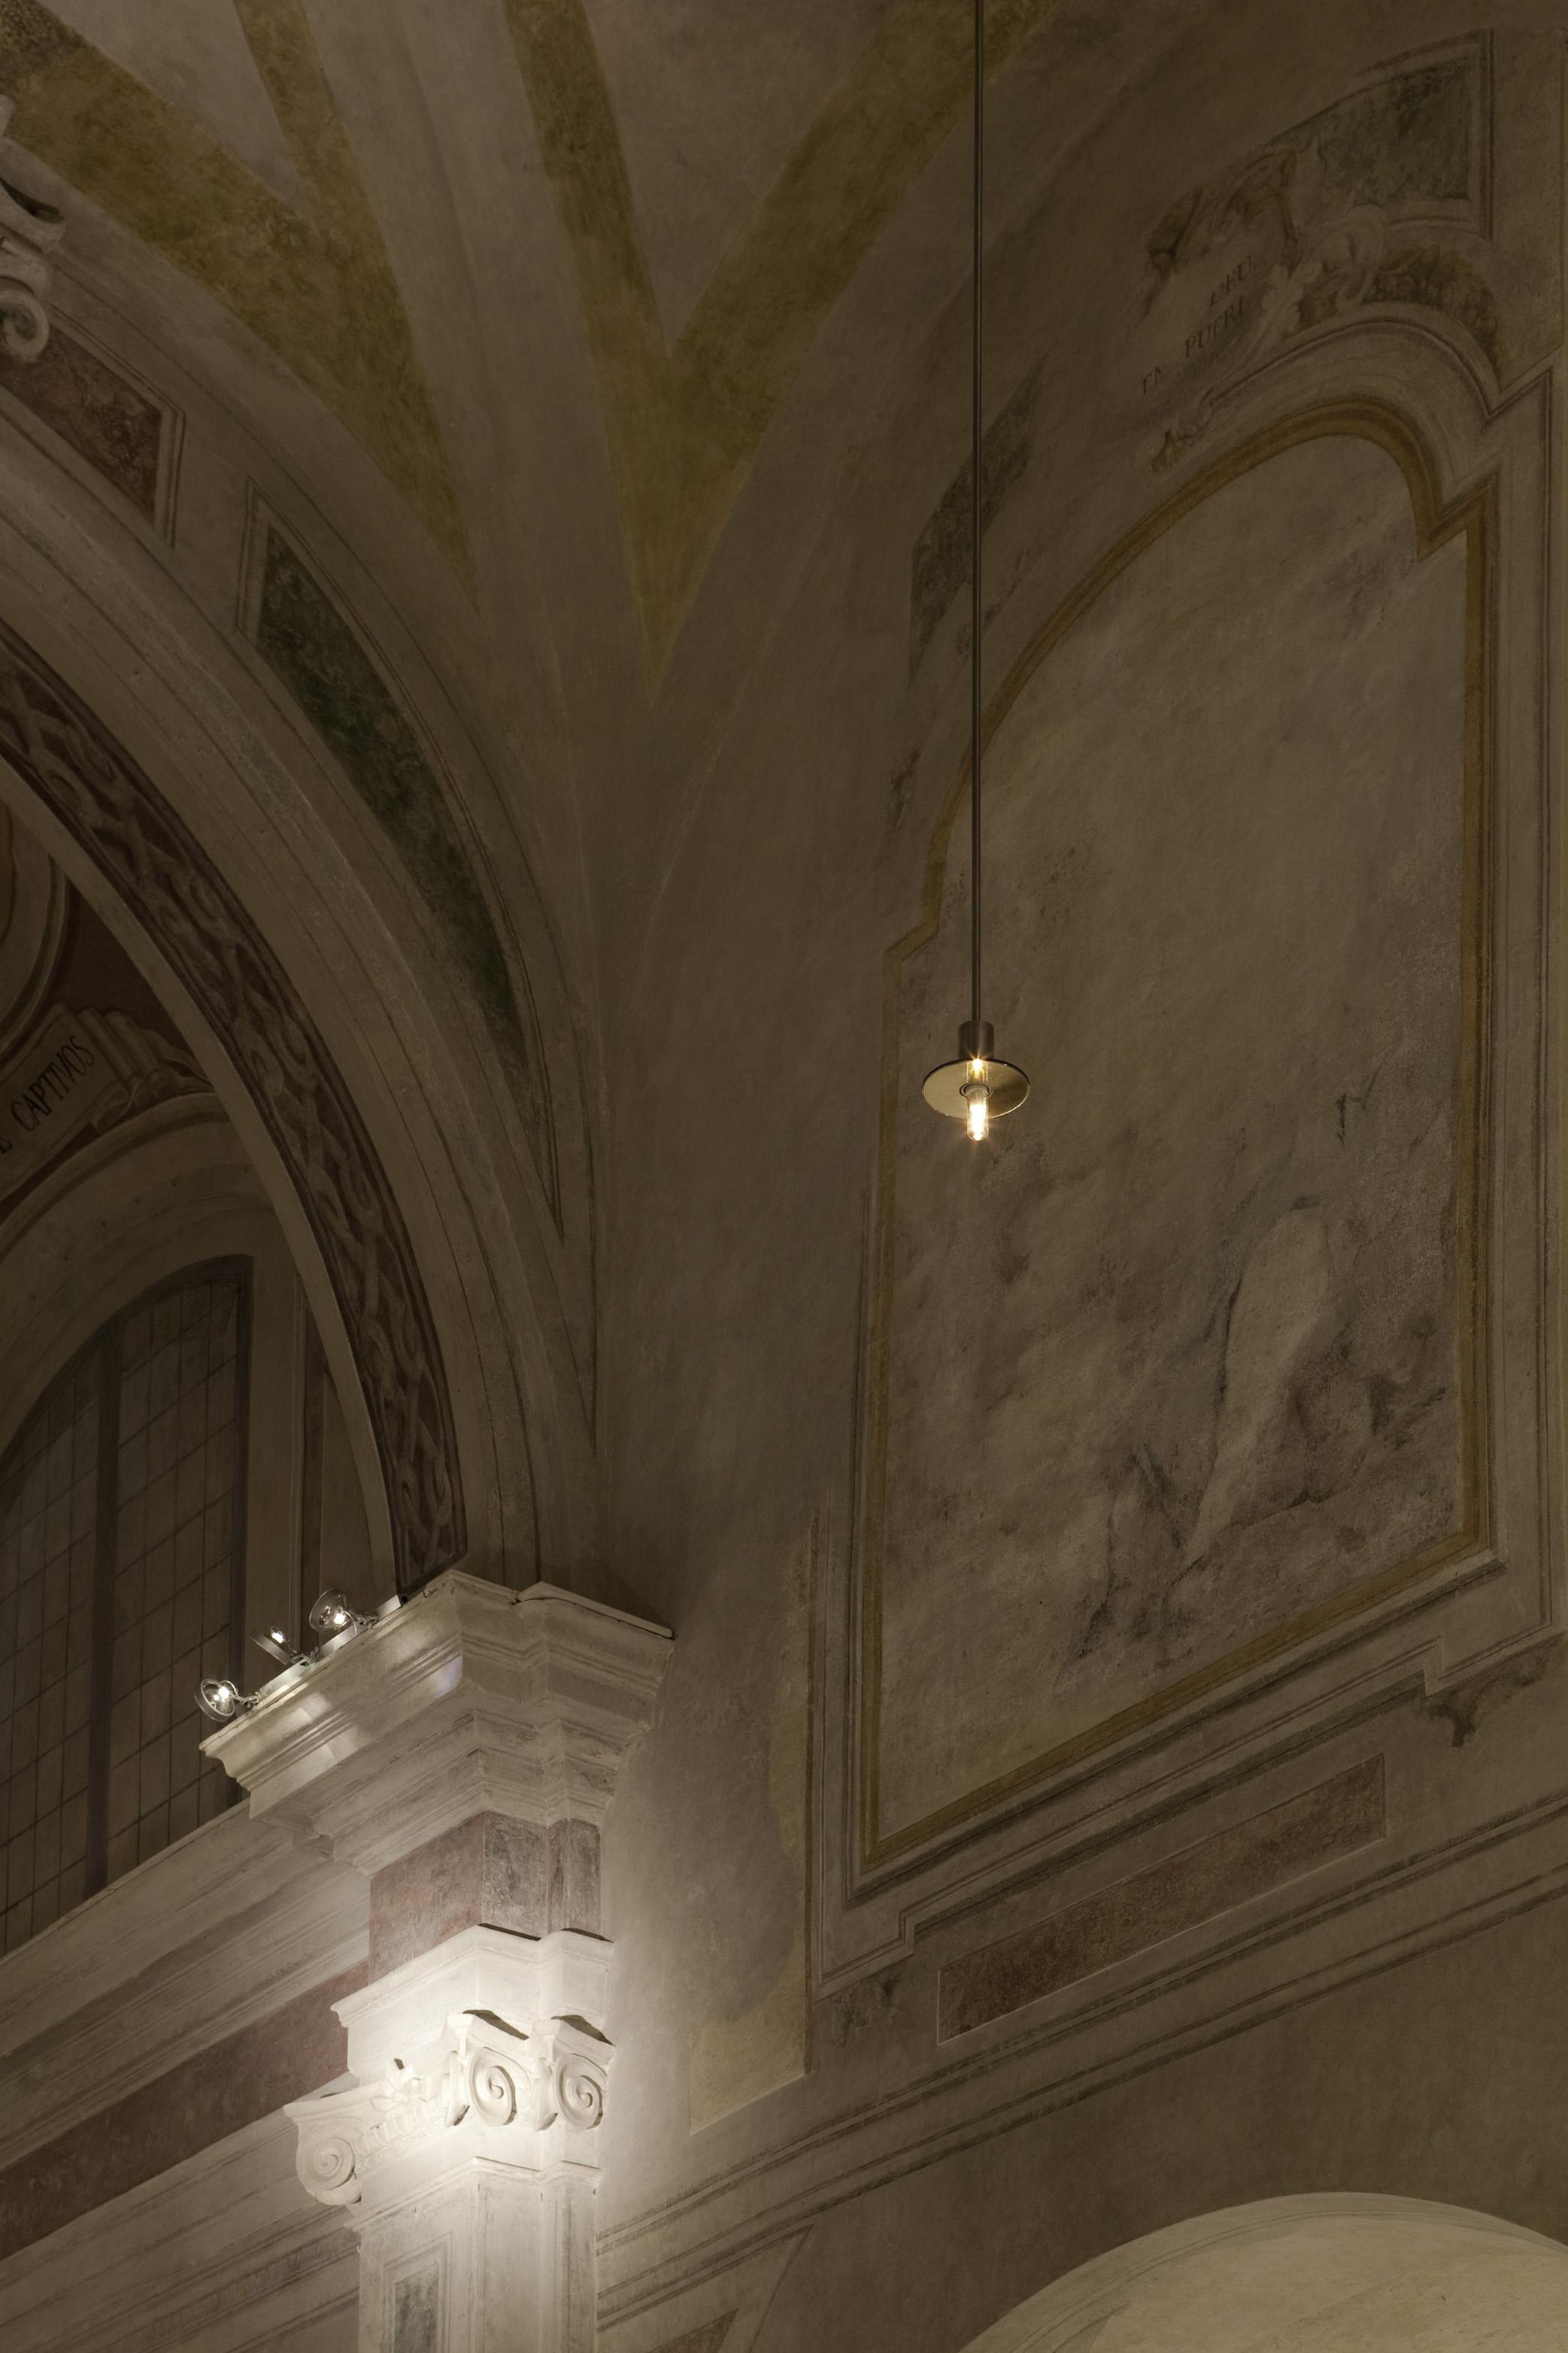 candela di vals_img12